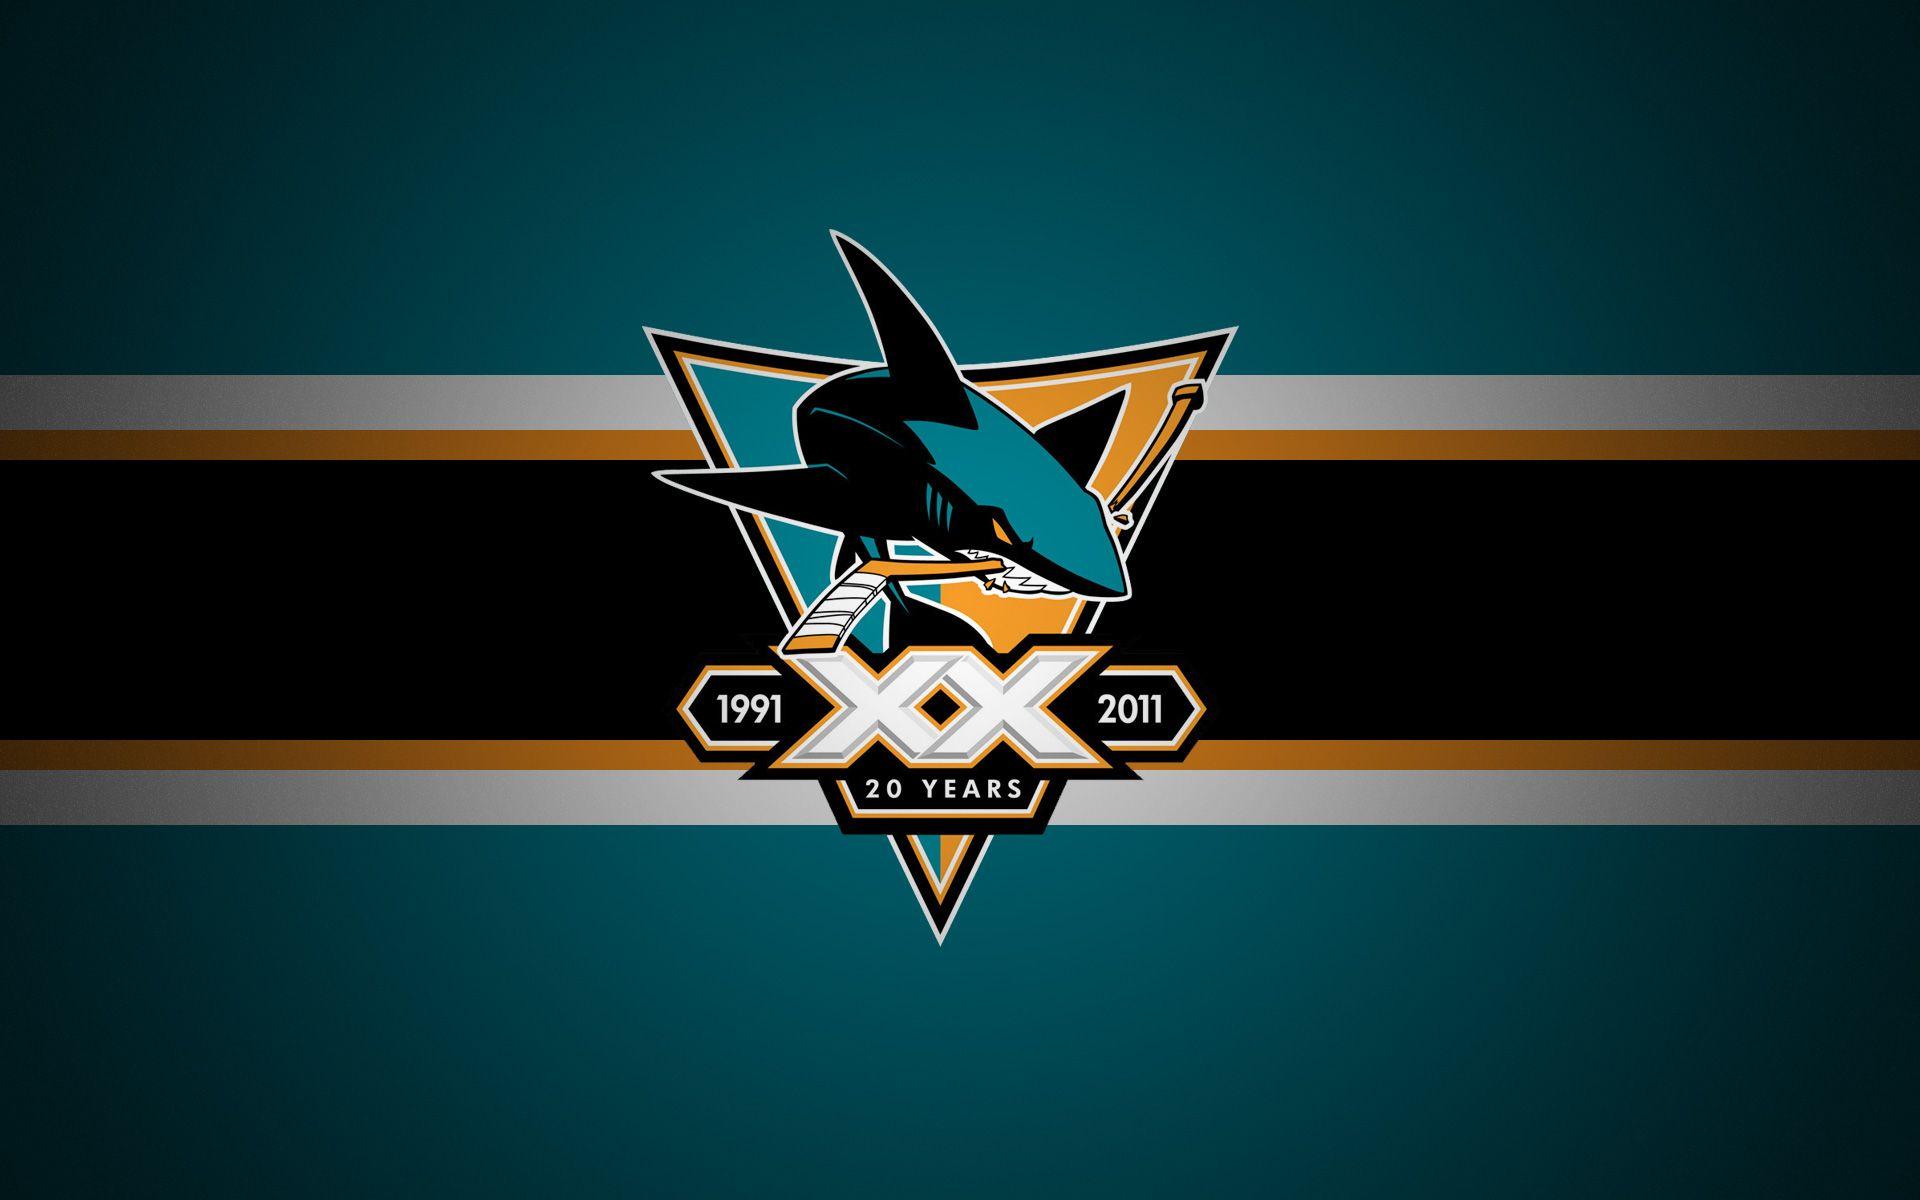 San Jose Sharks Wallpapers Download 69TG777   4USkY 1920x1200